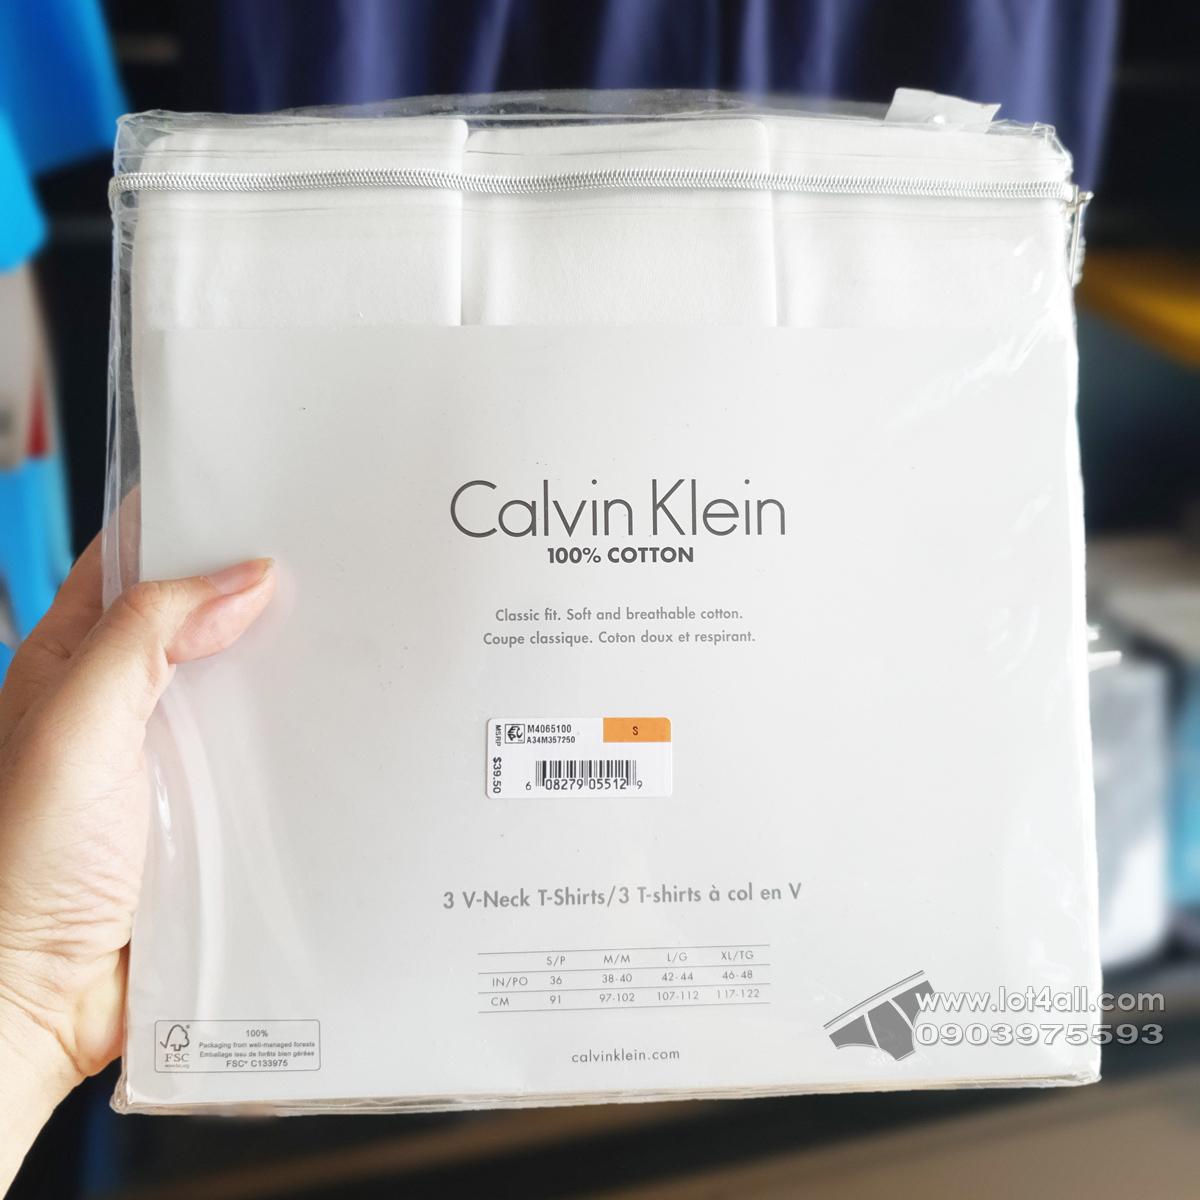 Áo lót nam Calvin Klein M4065 Cotton Classic Fit V-Neck T-Shirt 3-pack White